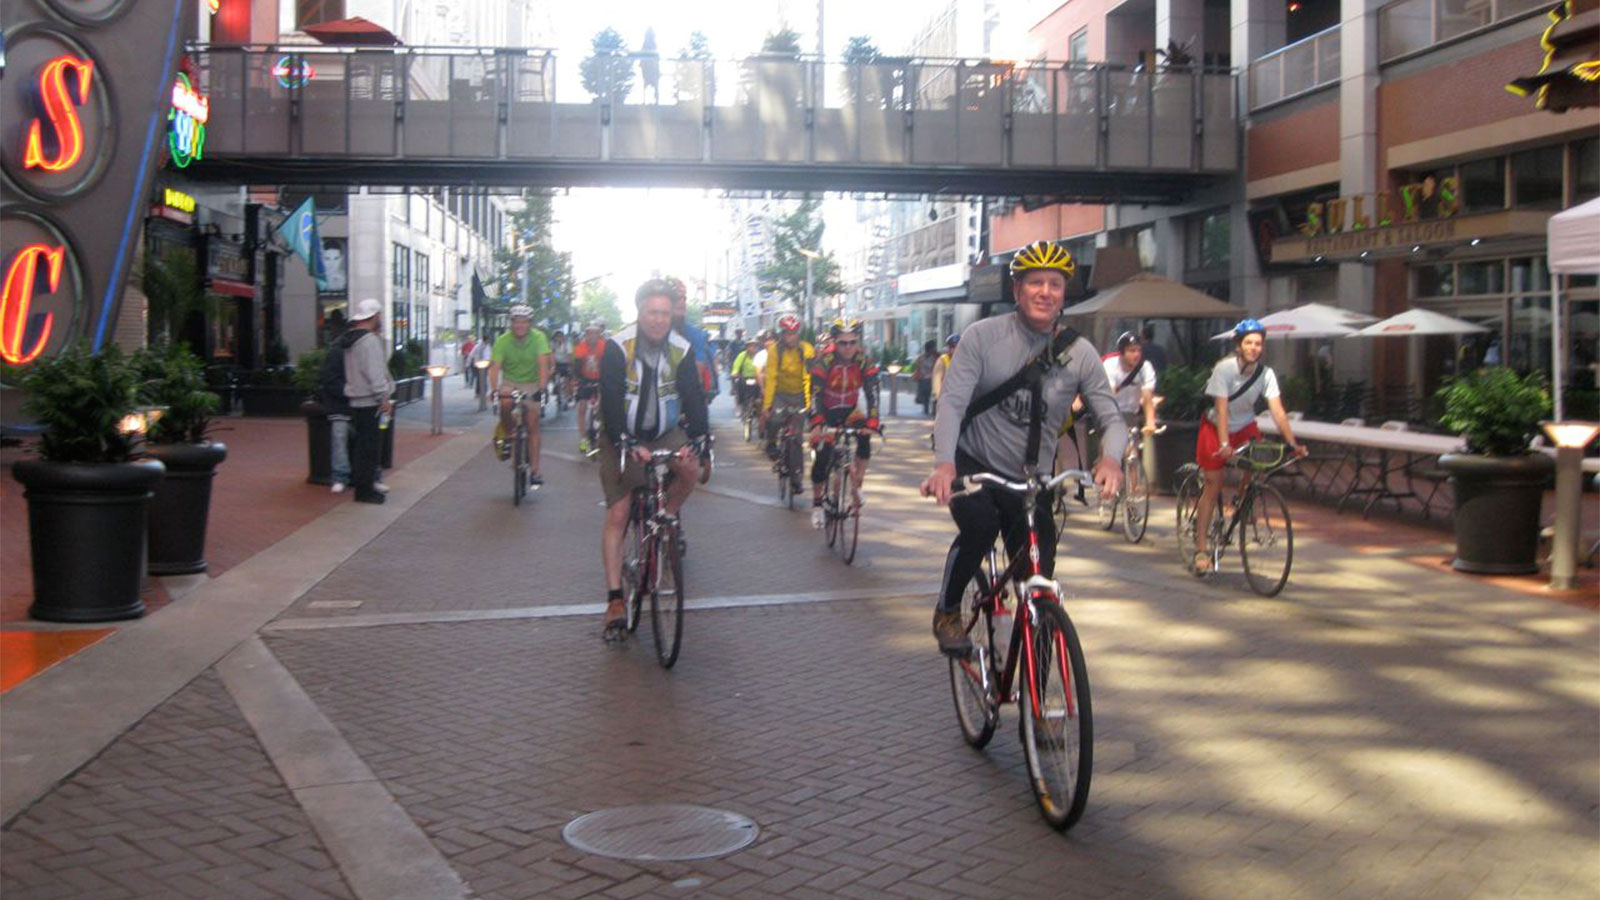 Bikers in Louisville